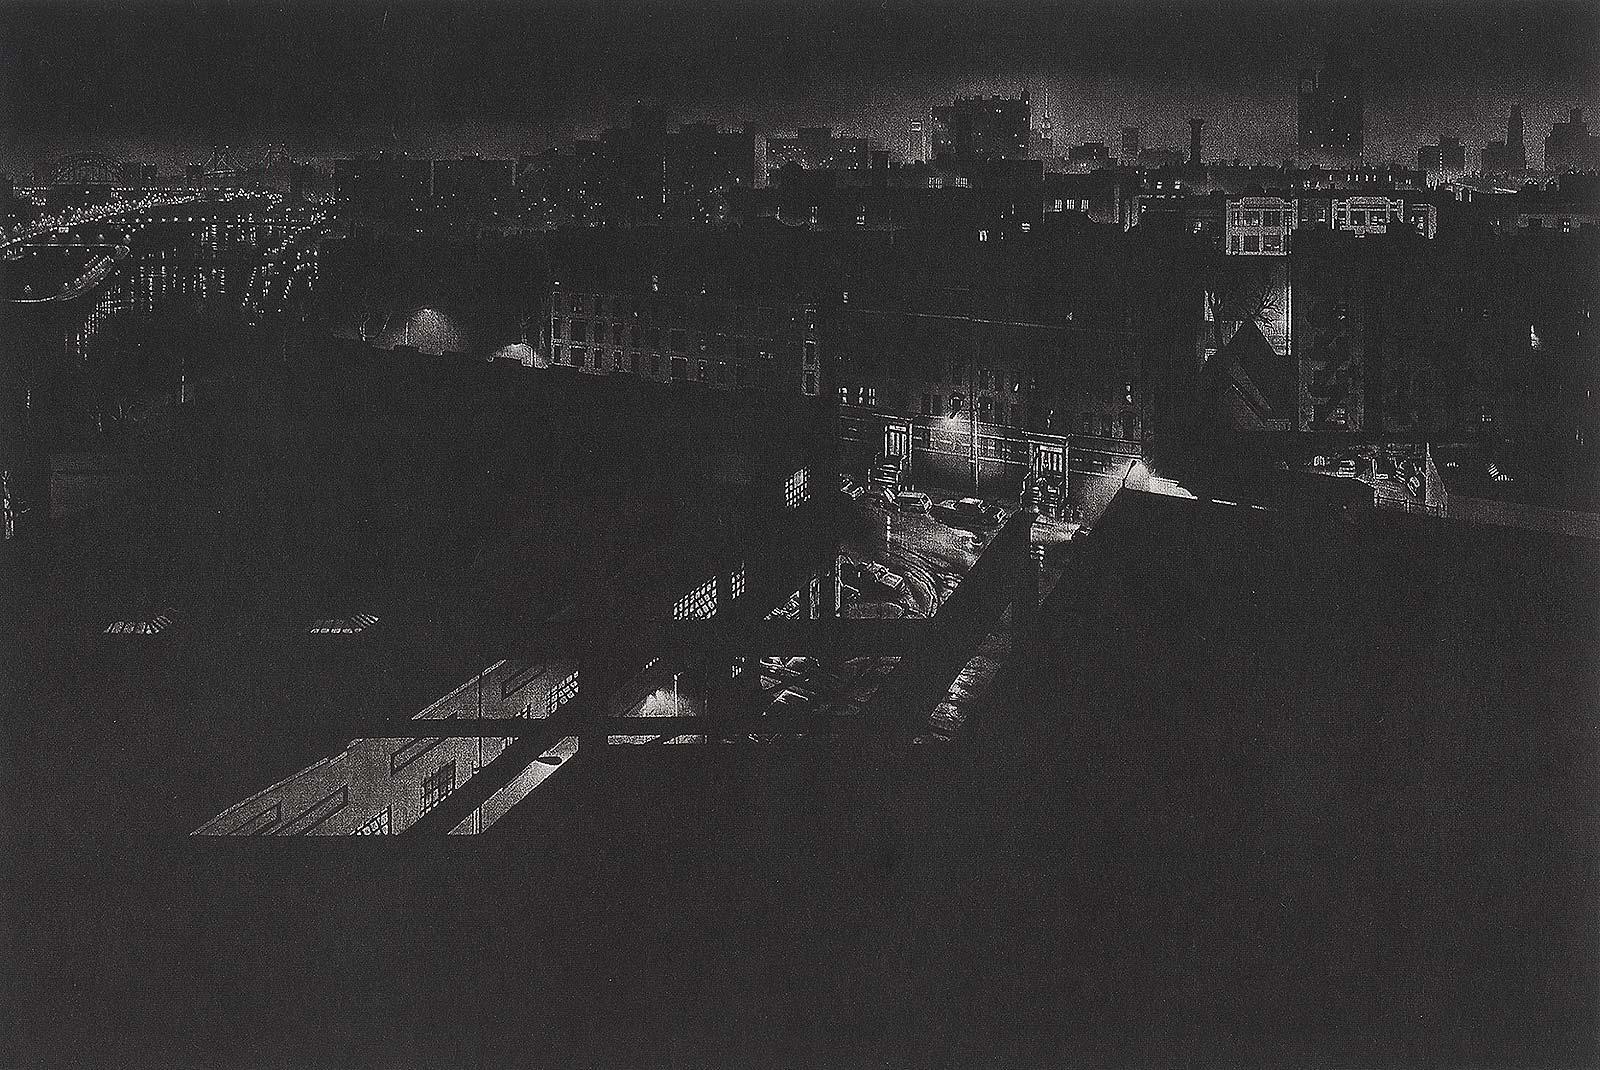 Girders (rainy night view of artist's former studio in Washington Heights